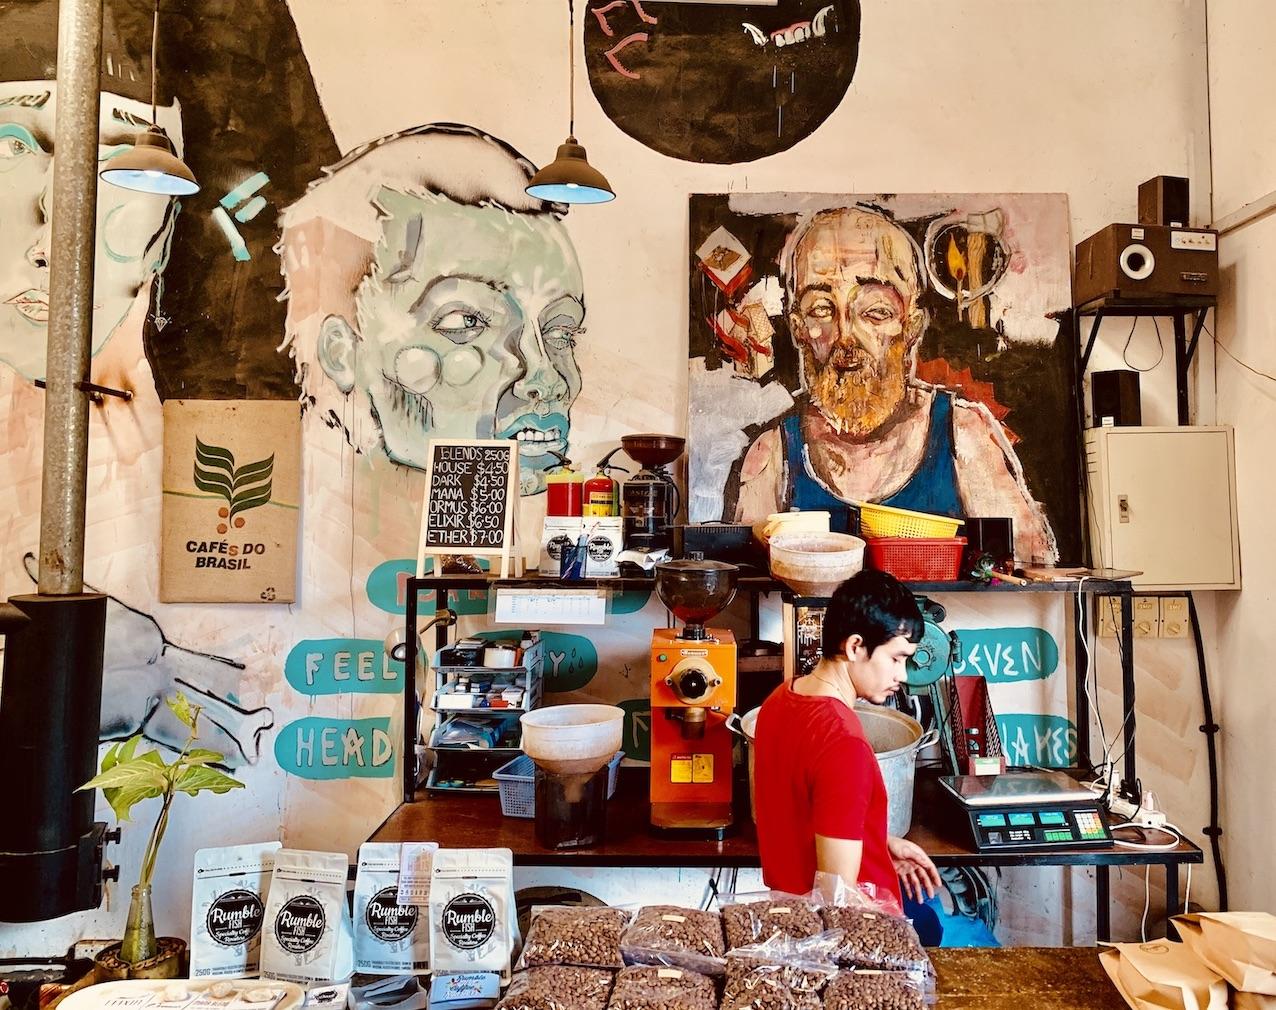 Cafe Espresso in Kampot.